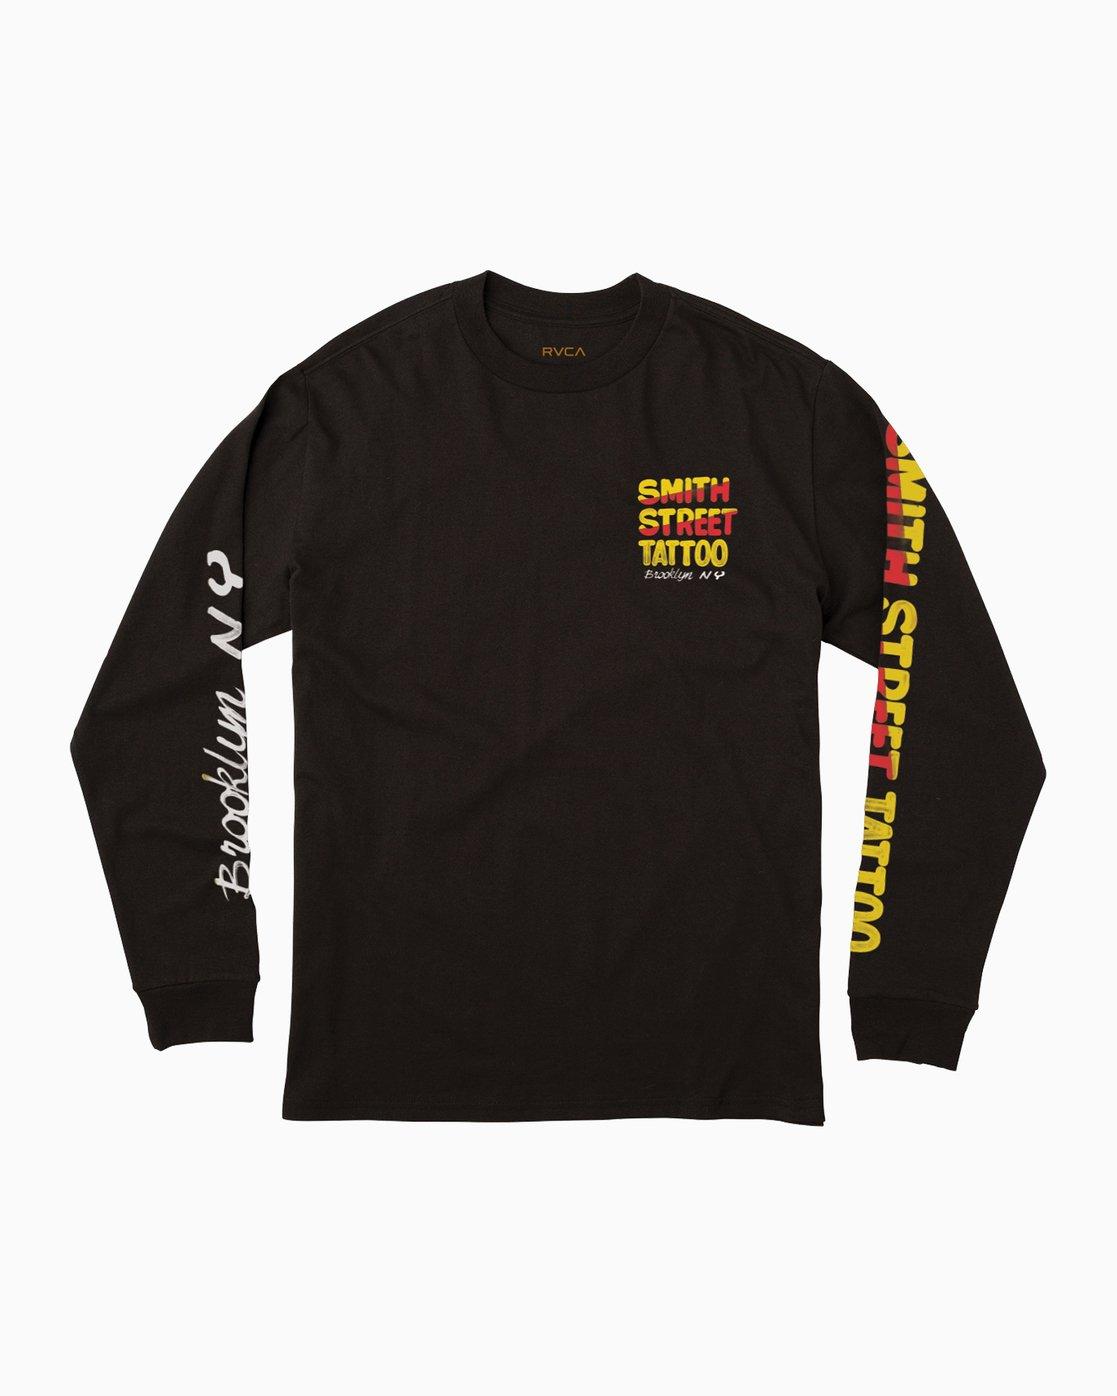 0 Smith Street Nurse 1 Long Sleeve T-Shirt Black M492QRST RVCA